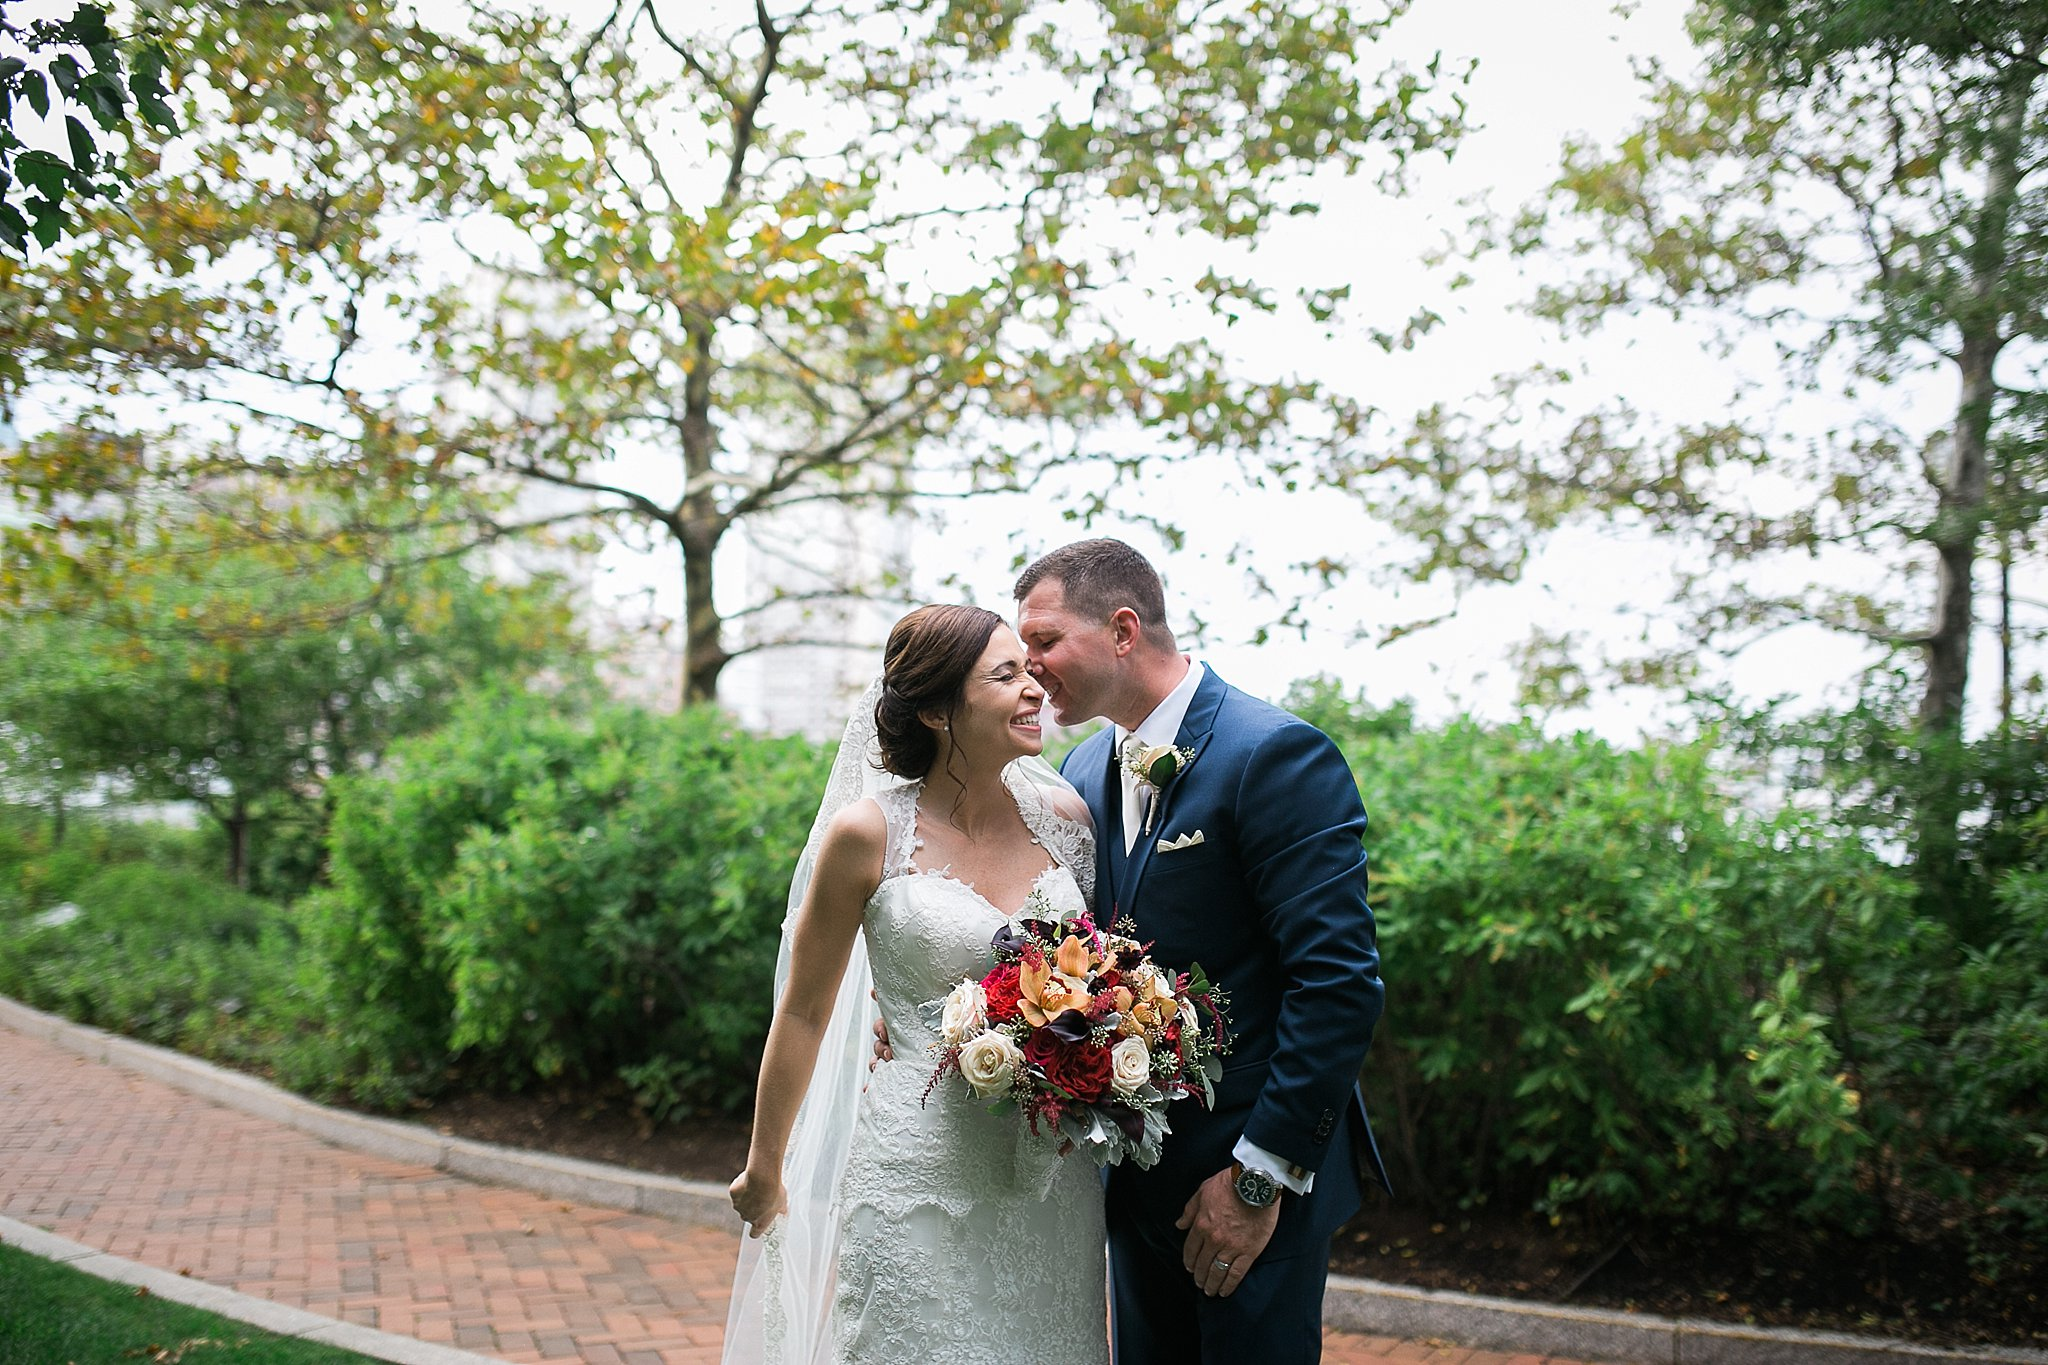 Seaport Hotel Wedding Boston Photographer Sweet Alice48.jpg